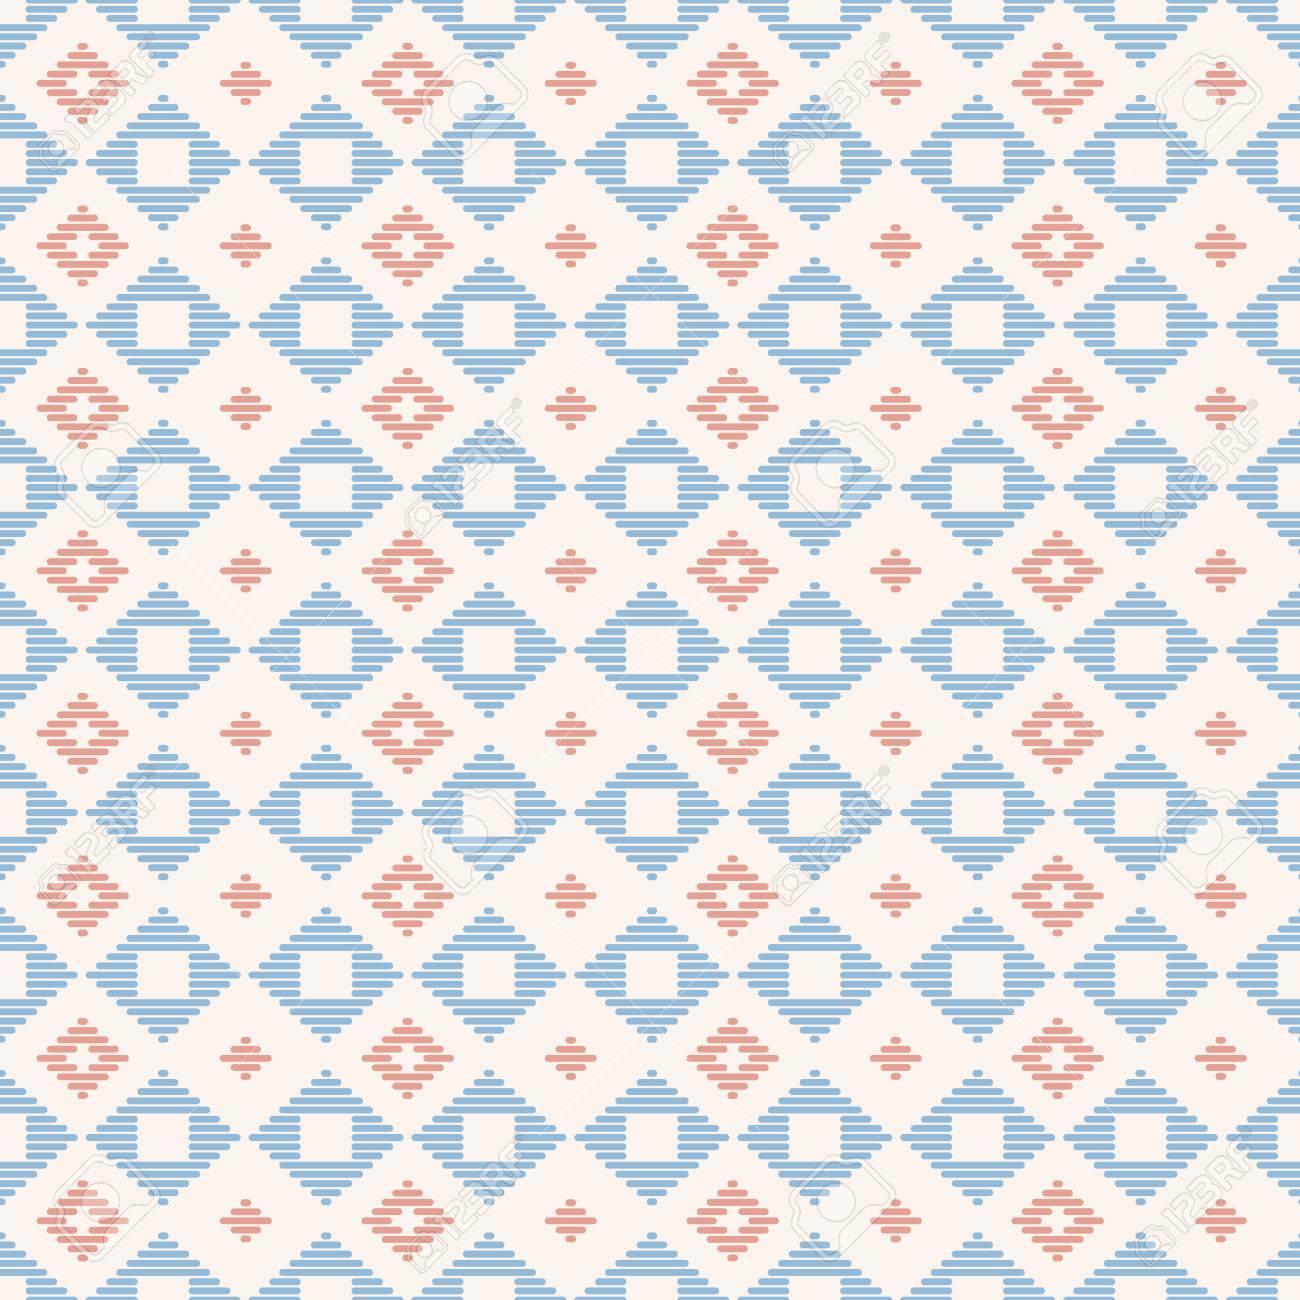 Patrón Geométrico Sin Costuras Bordado Kogin Japonés. Ornamento ...